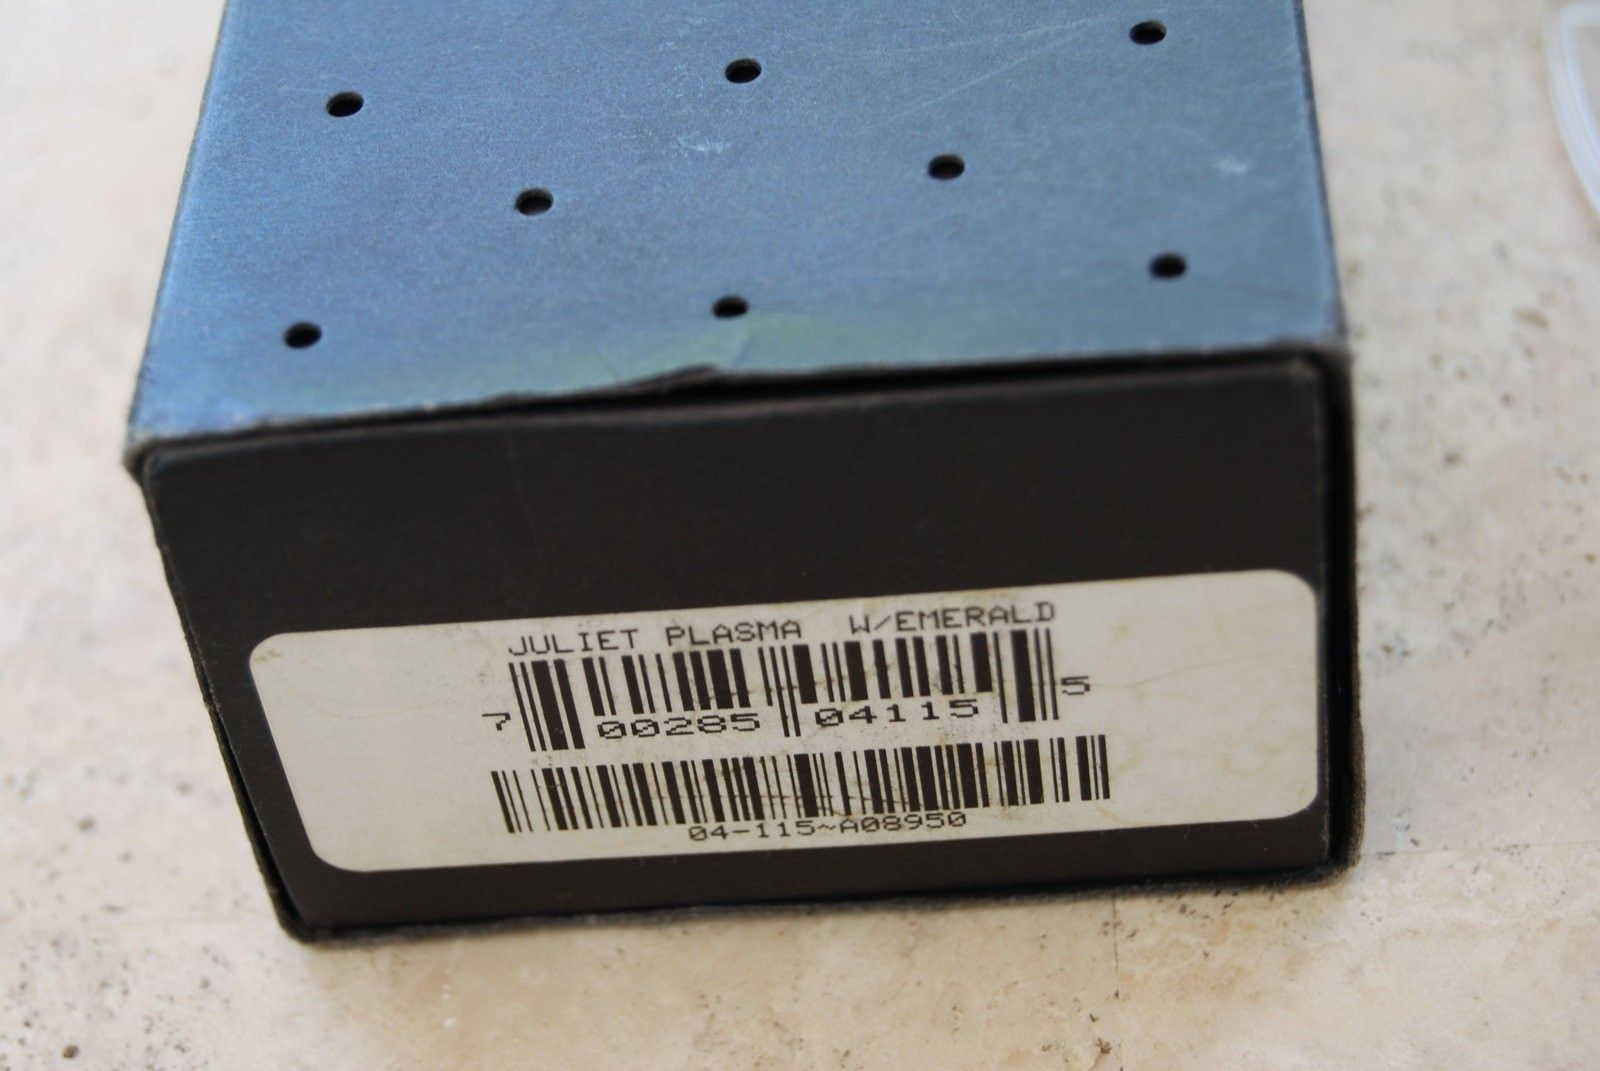 Juliets: Ichiro Polished/Blue, 2nd gen XM Ruby, Emerald - DSC_0181.JPG